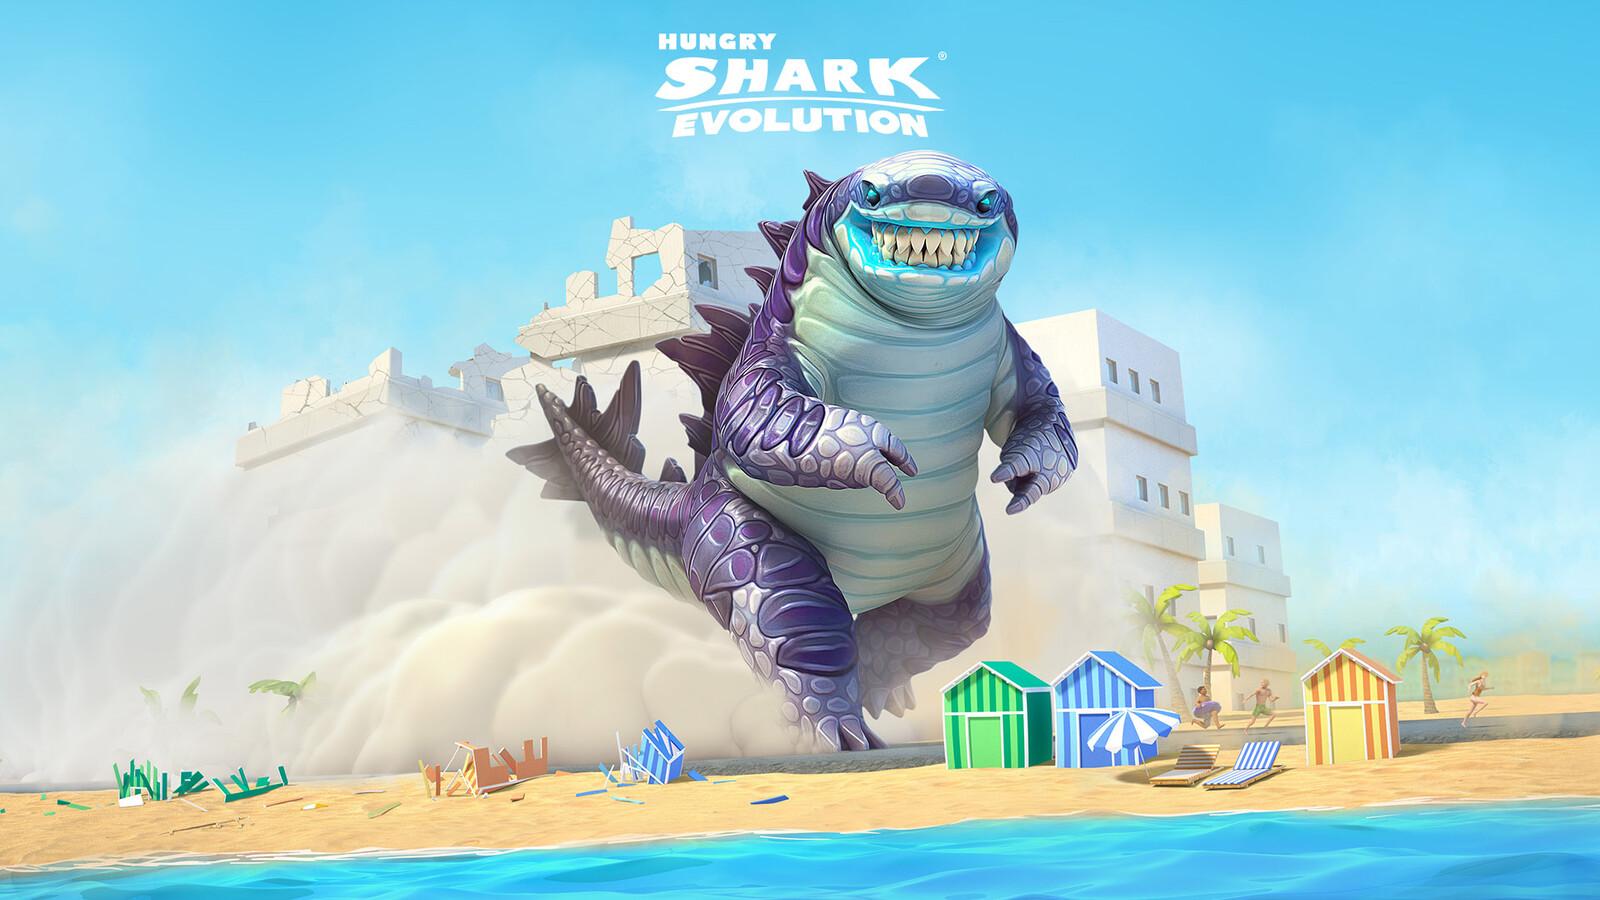 Hungry Shark Evolution Keyarts